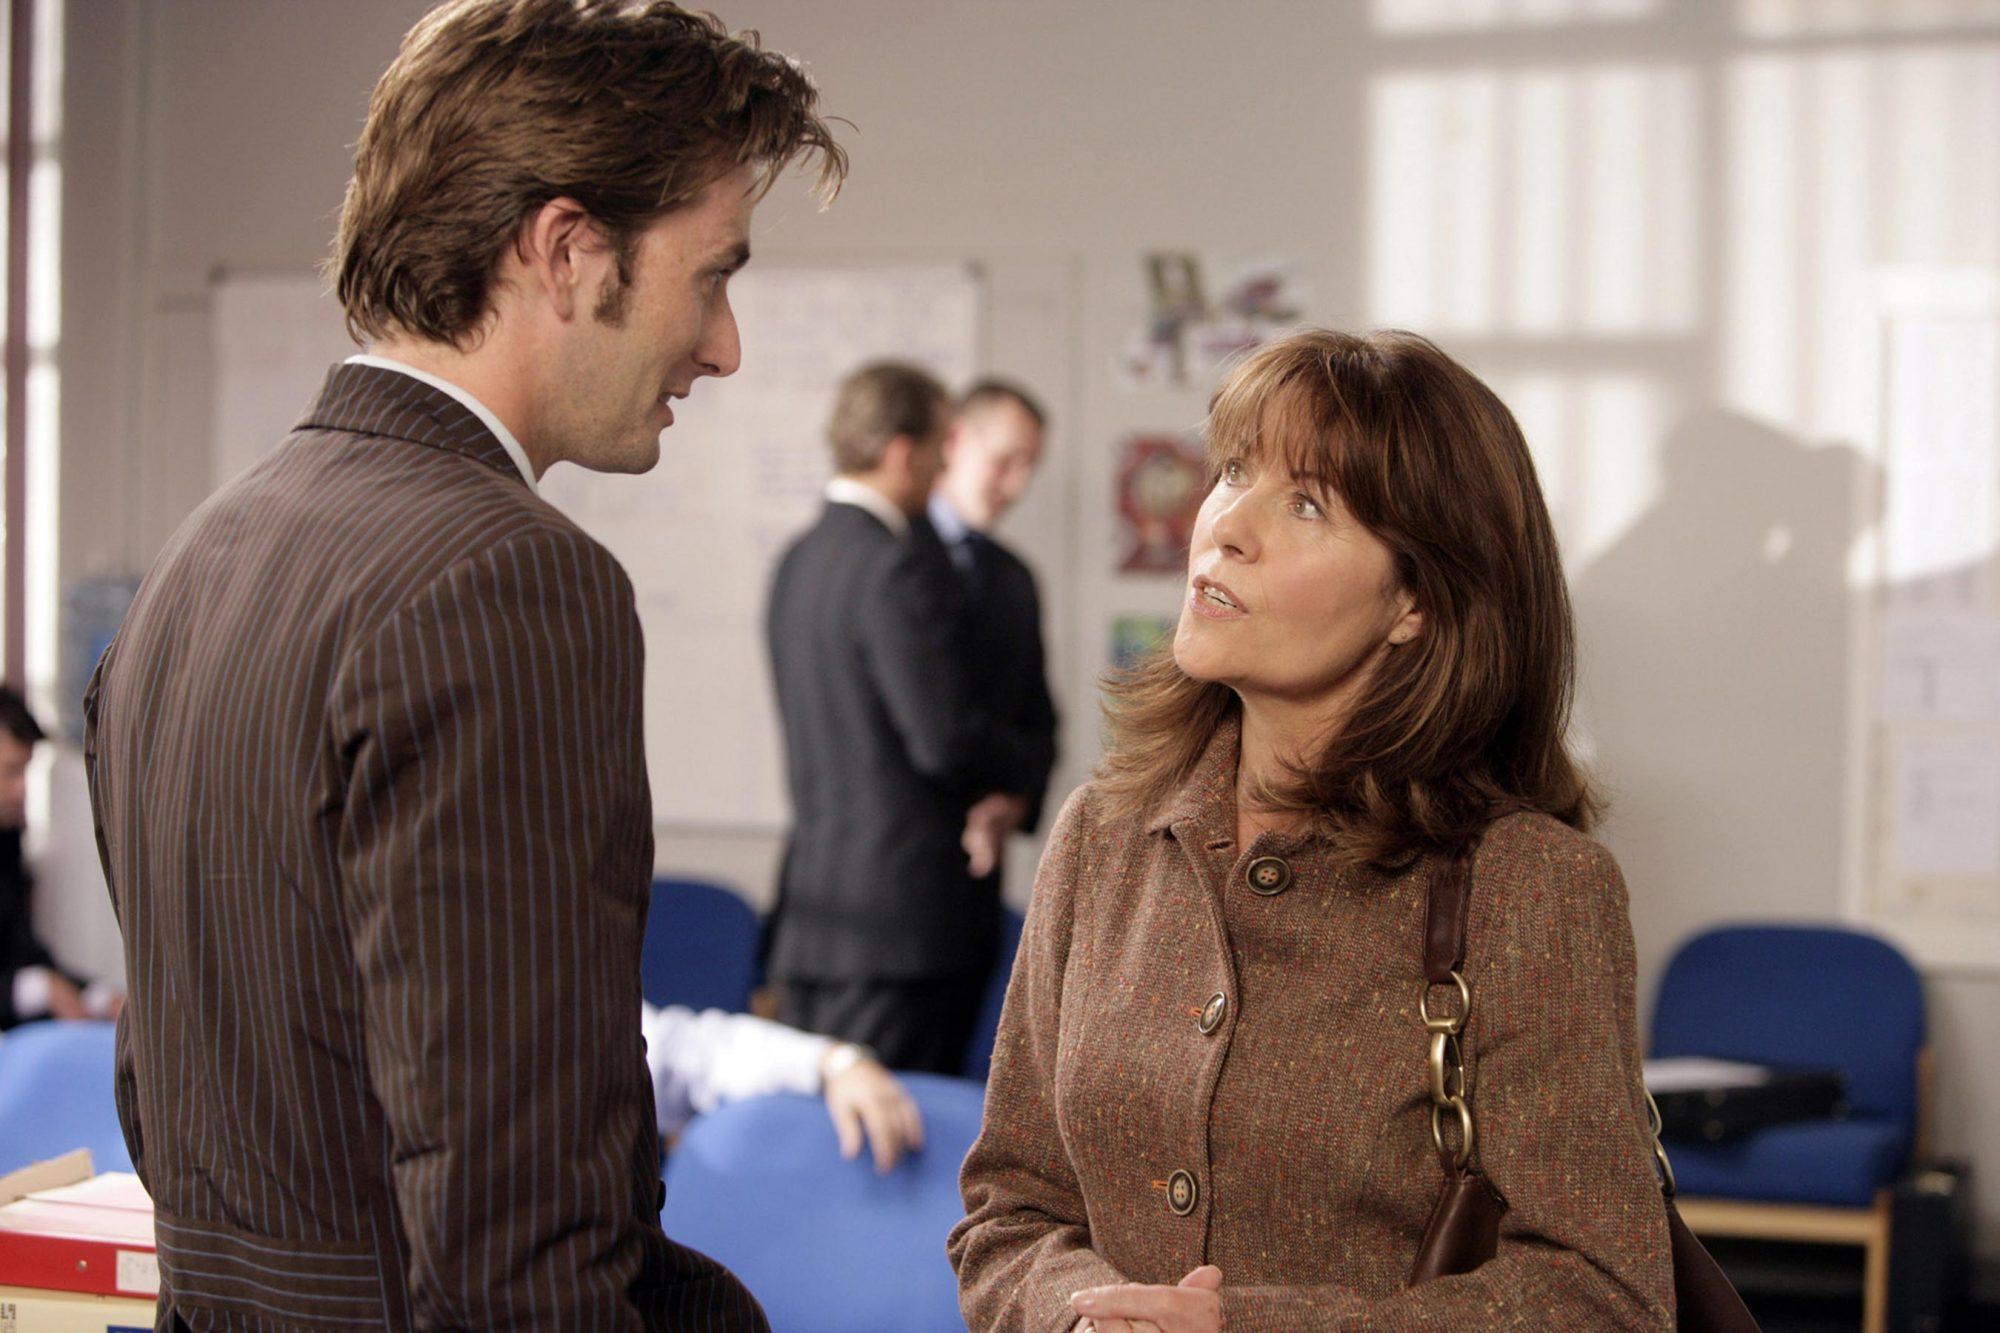 DOCTOR WHO, David Tennant, Elisabeth Sladen, 'School Reunion', (Season 2, ep. 203), 2005-. photo: Ad